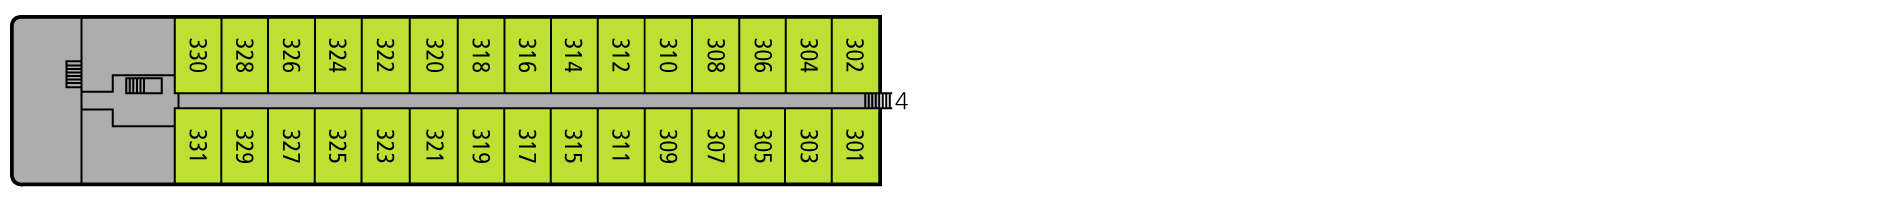 A-ROSA STELLA Deck 3